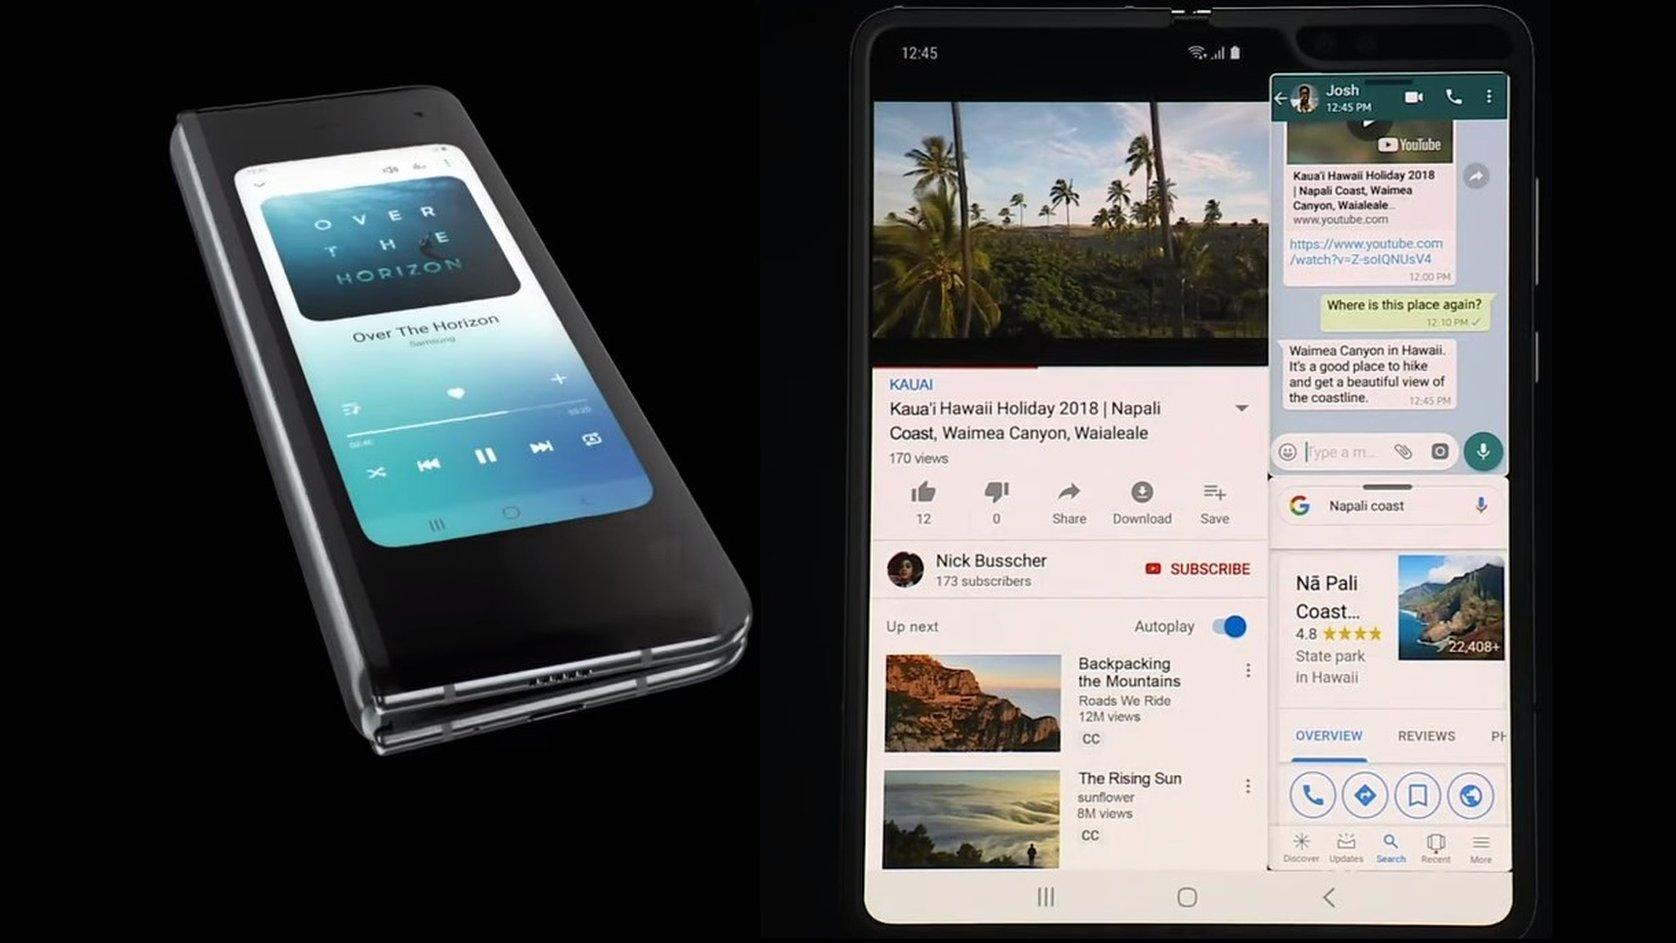 Galaxy Fold: Samsung unveils 'luxury' smartphone